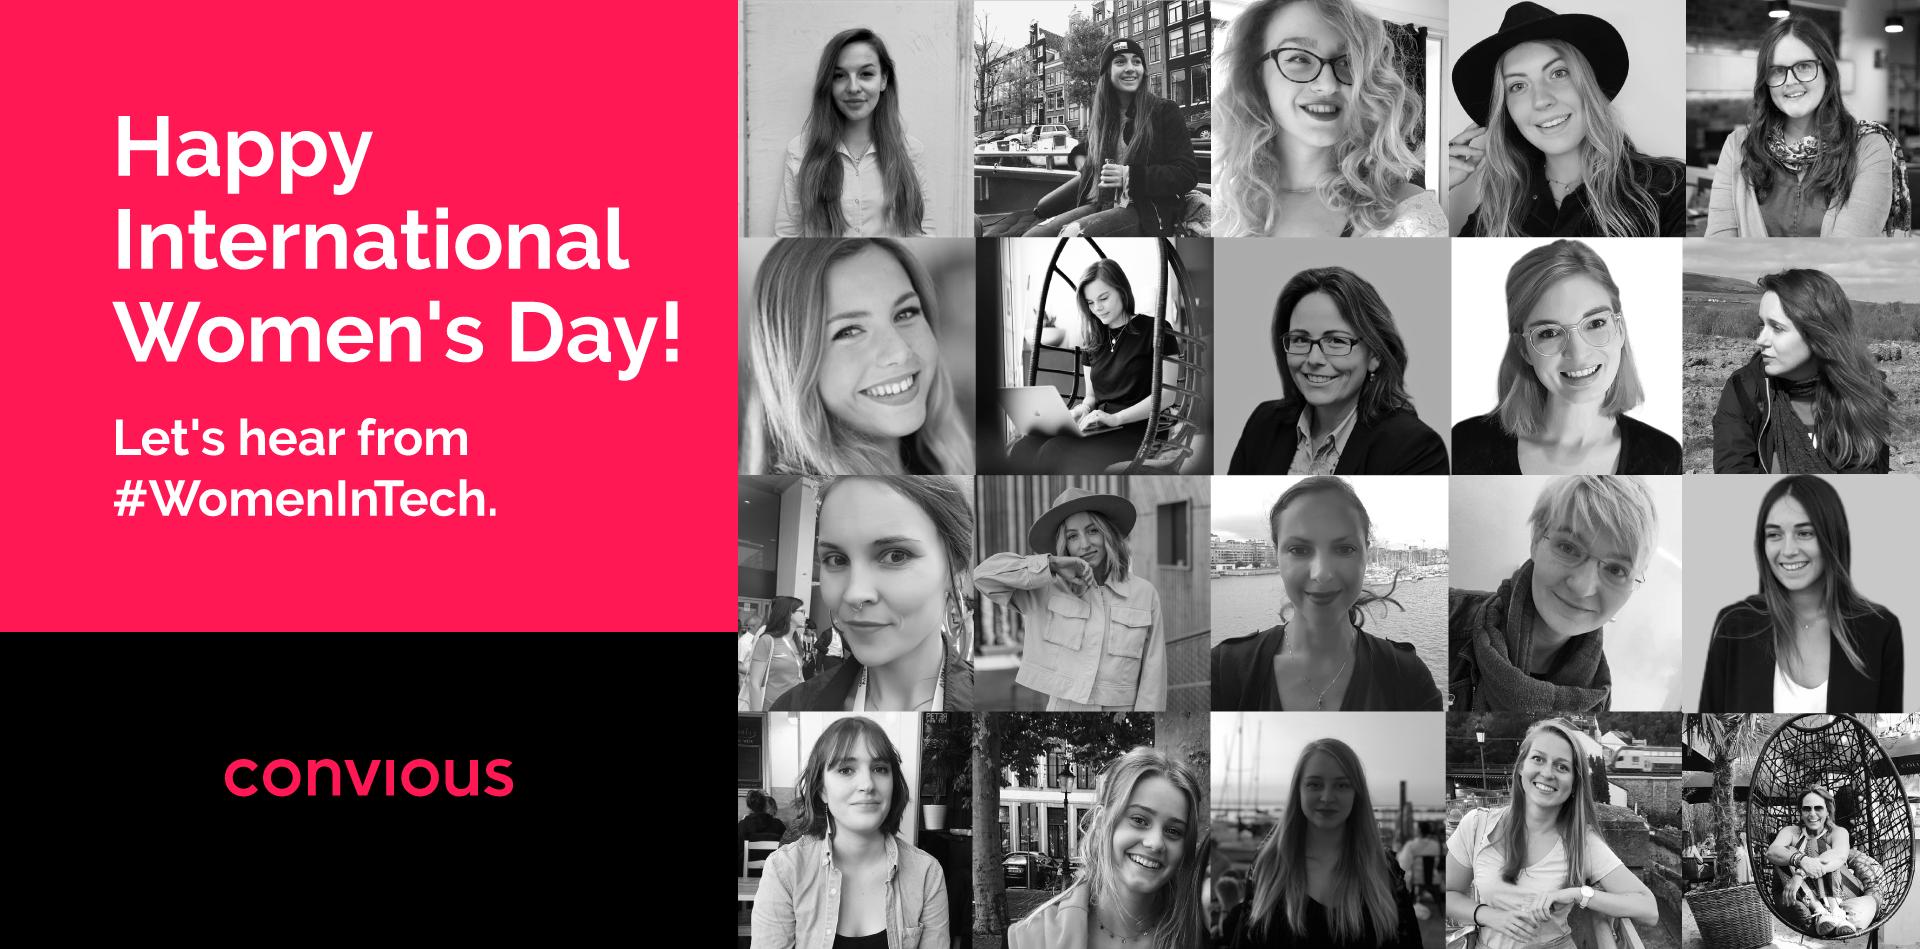 Happy International Women's Day! #WomenInData